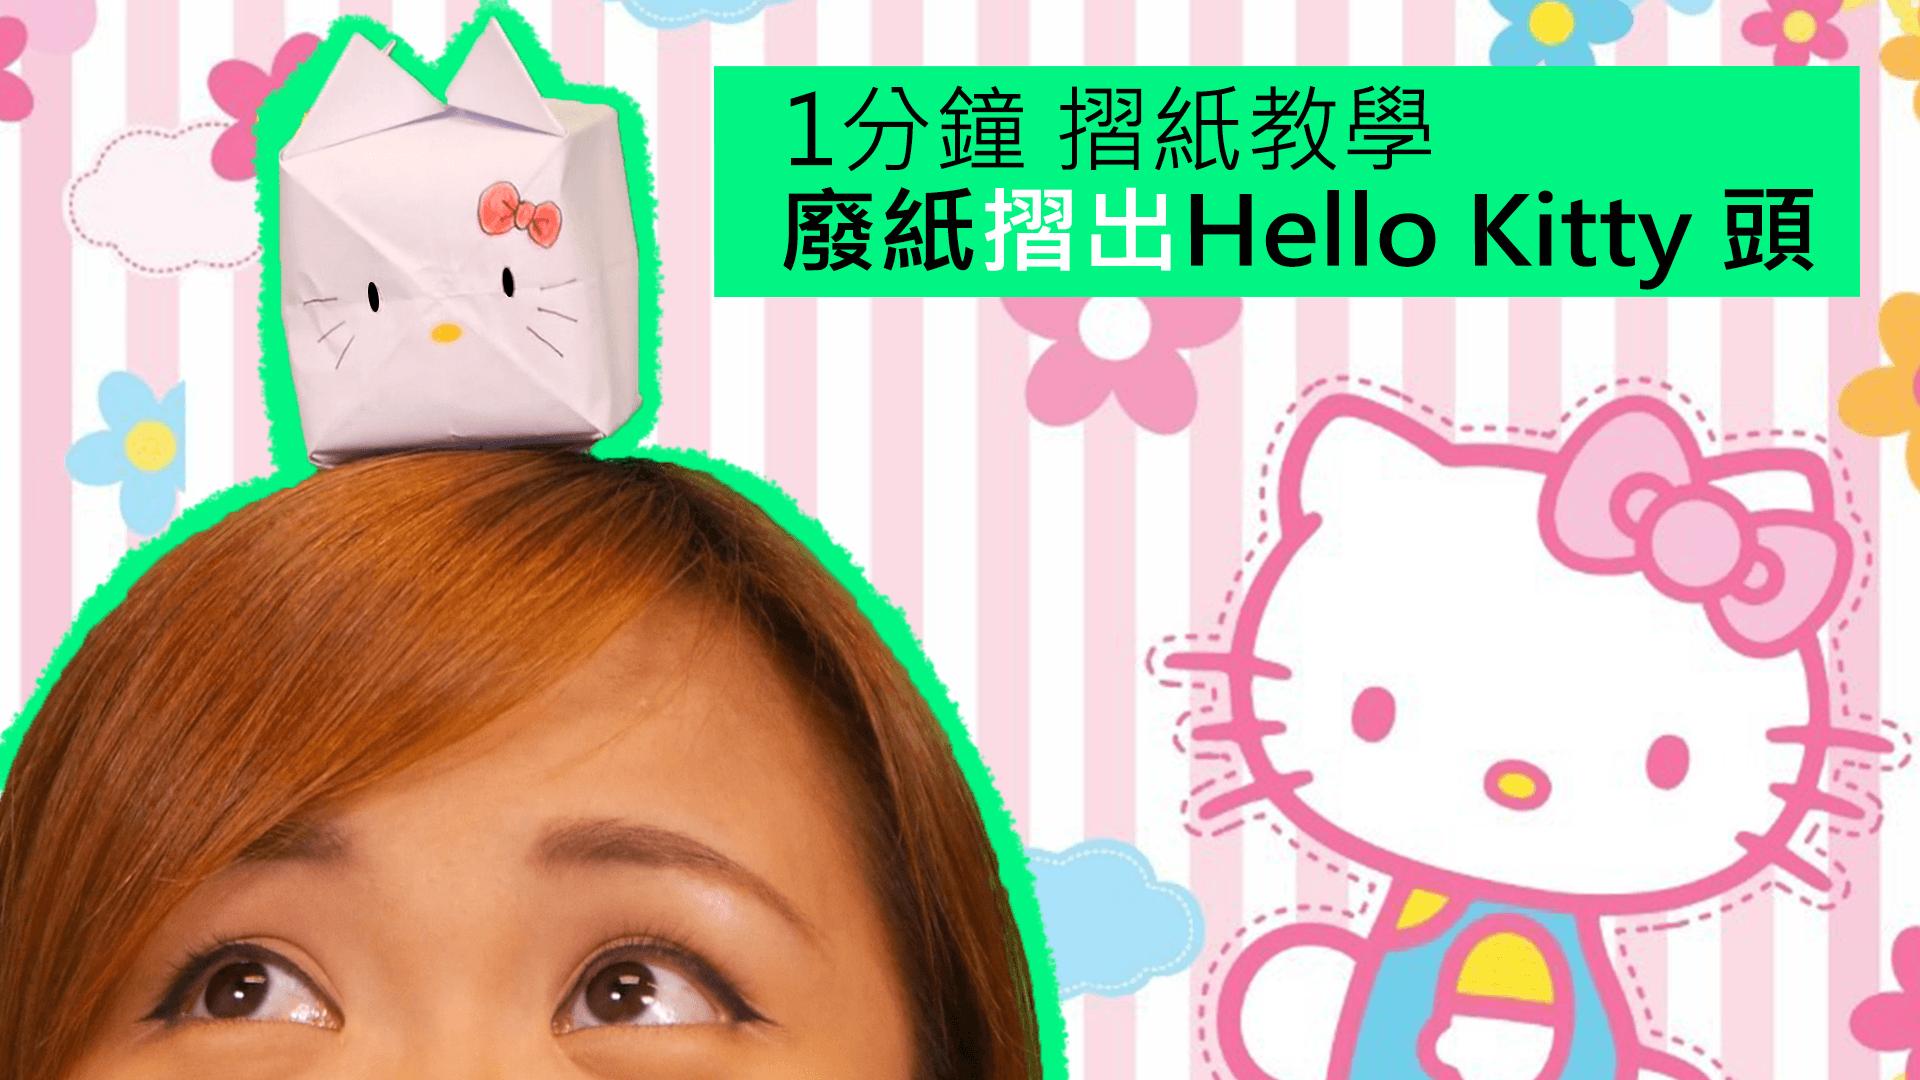 【unwire TV】1分鐘摺紙教學 廢紙摺出Hello Kitty頭 - 香港 unwire.hk